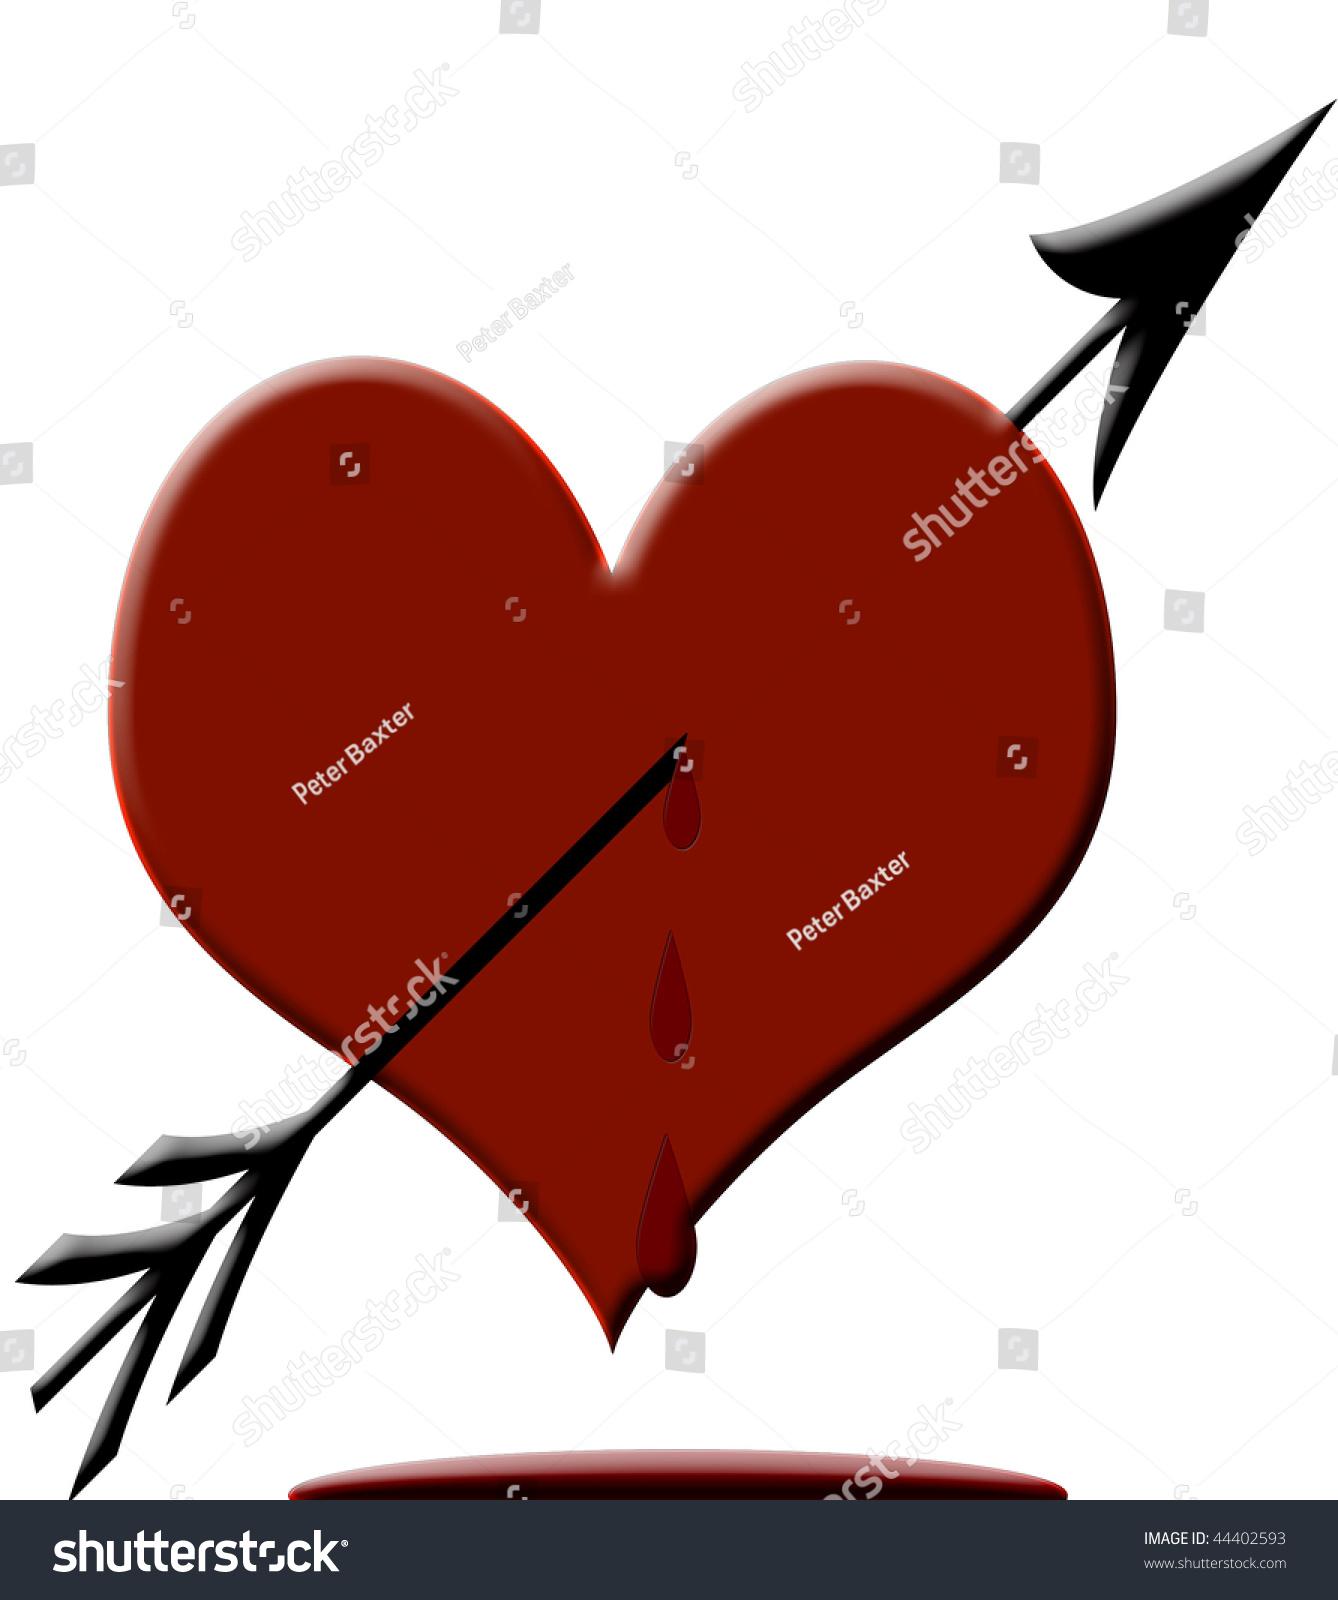 Bleeding heart true symbol love stock illustration 44402593 bleeding heart the true symbol of love buycottarizona